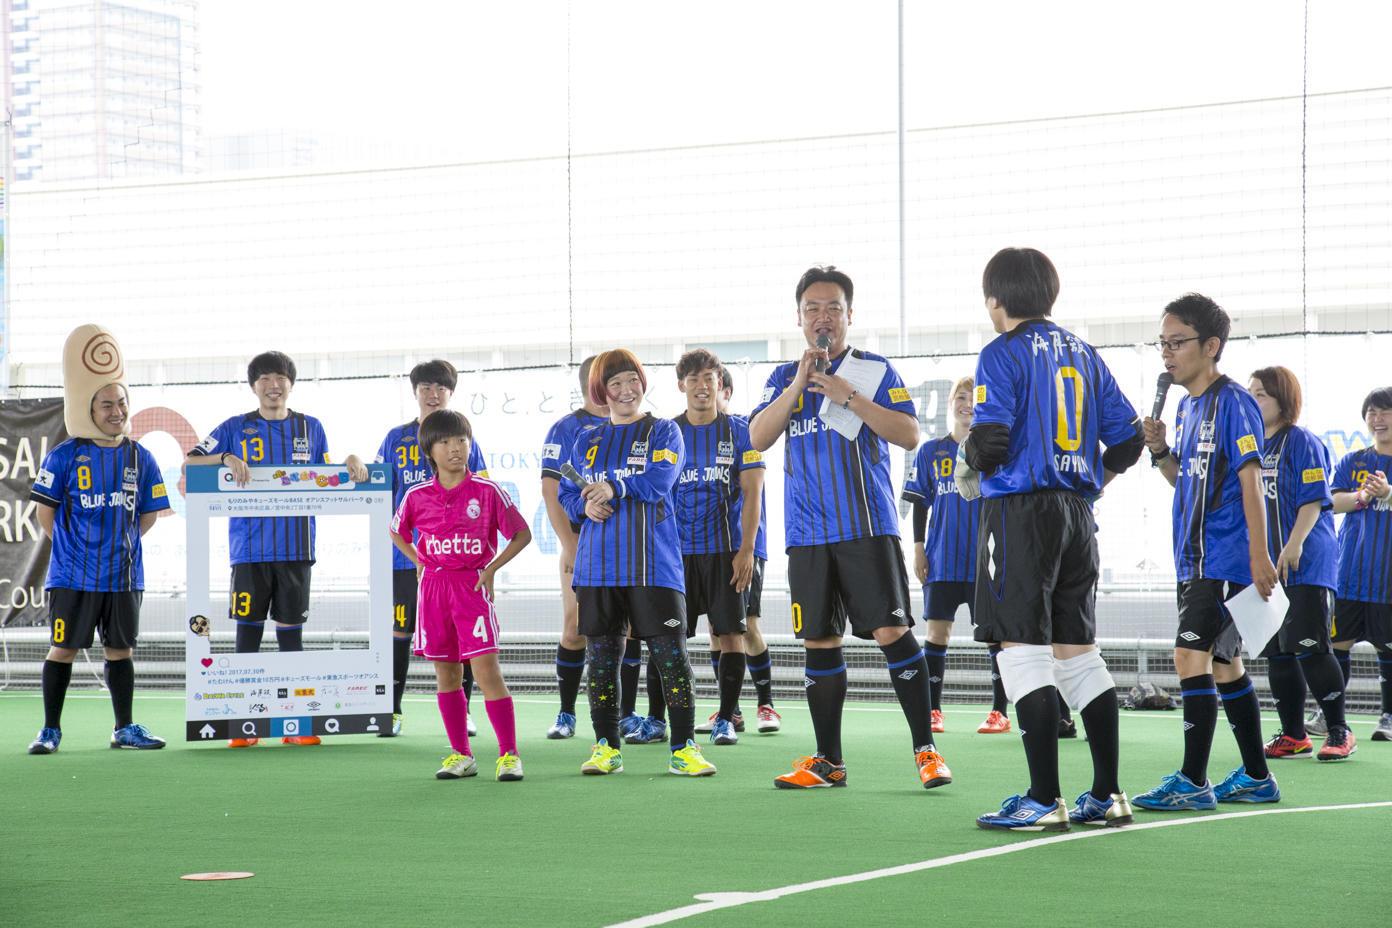 http://news.yoshimoto.co.jp/20170802174210-cc931f21f2aa6a4ac1d7b9daf1bb6bddc2197763.jpg